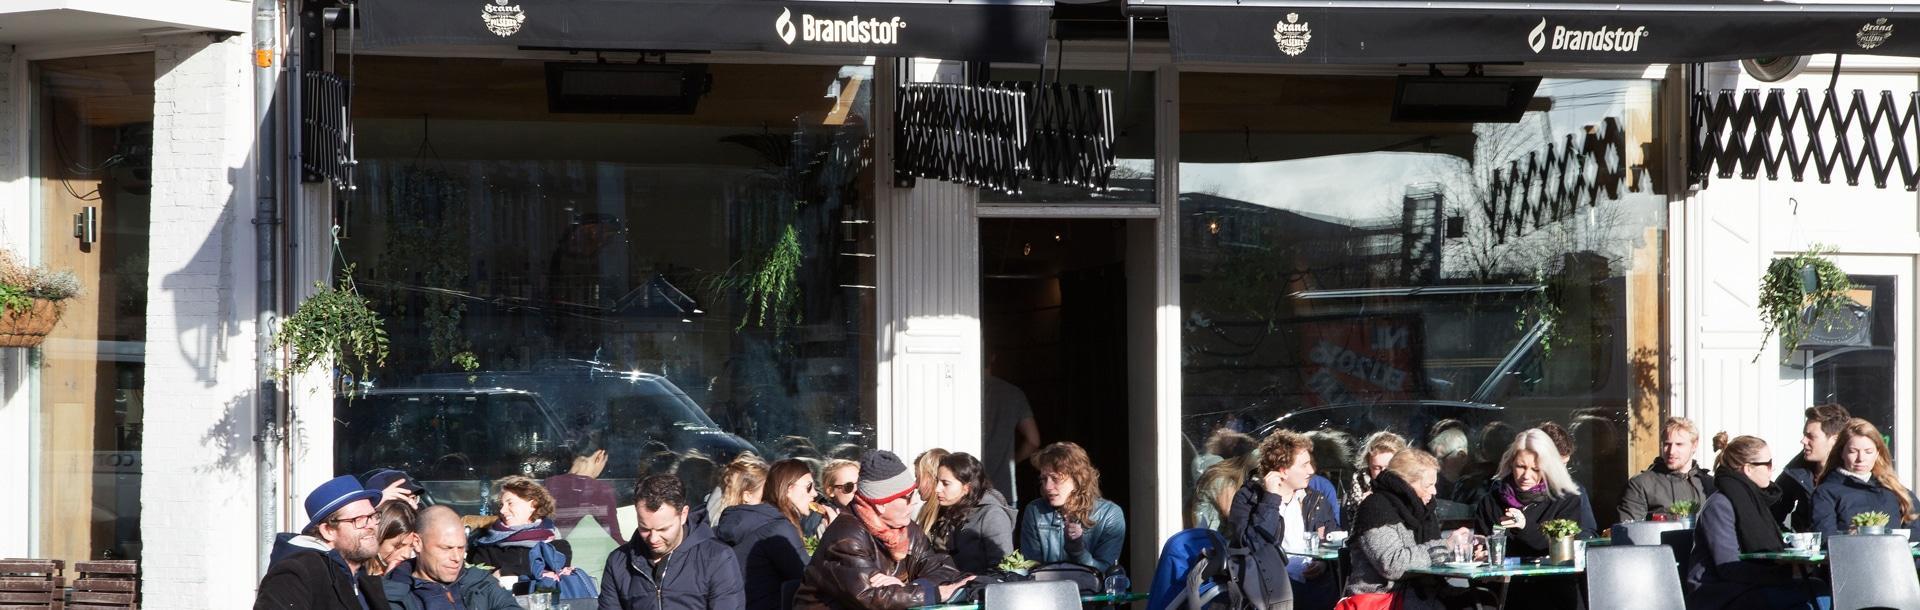 Cafe_Brandstof_Nice2know_Locatie